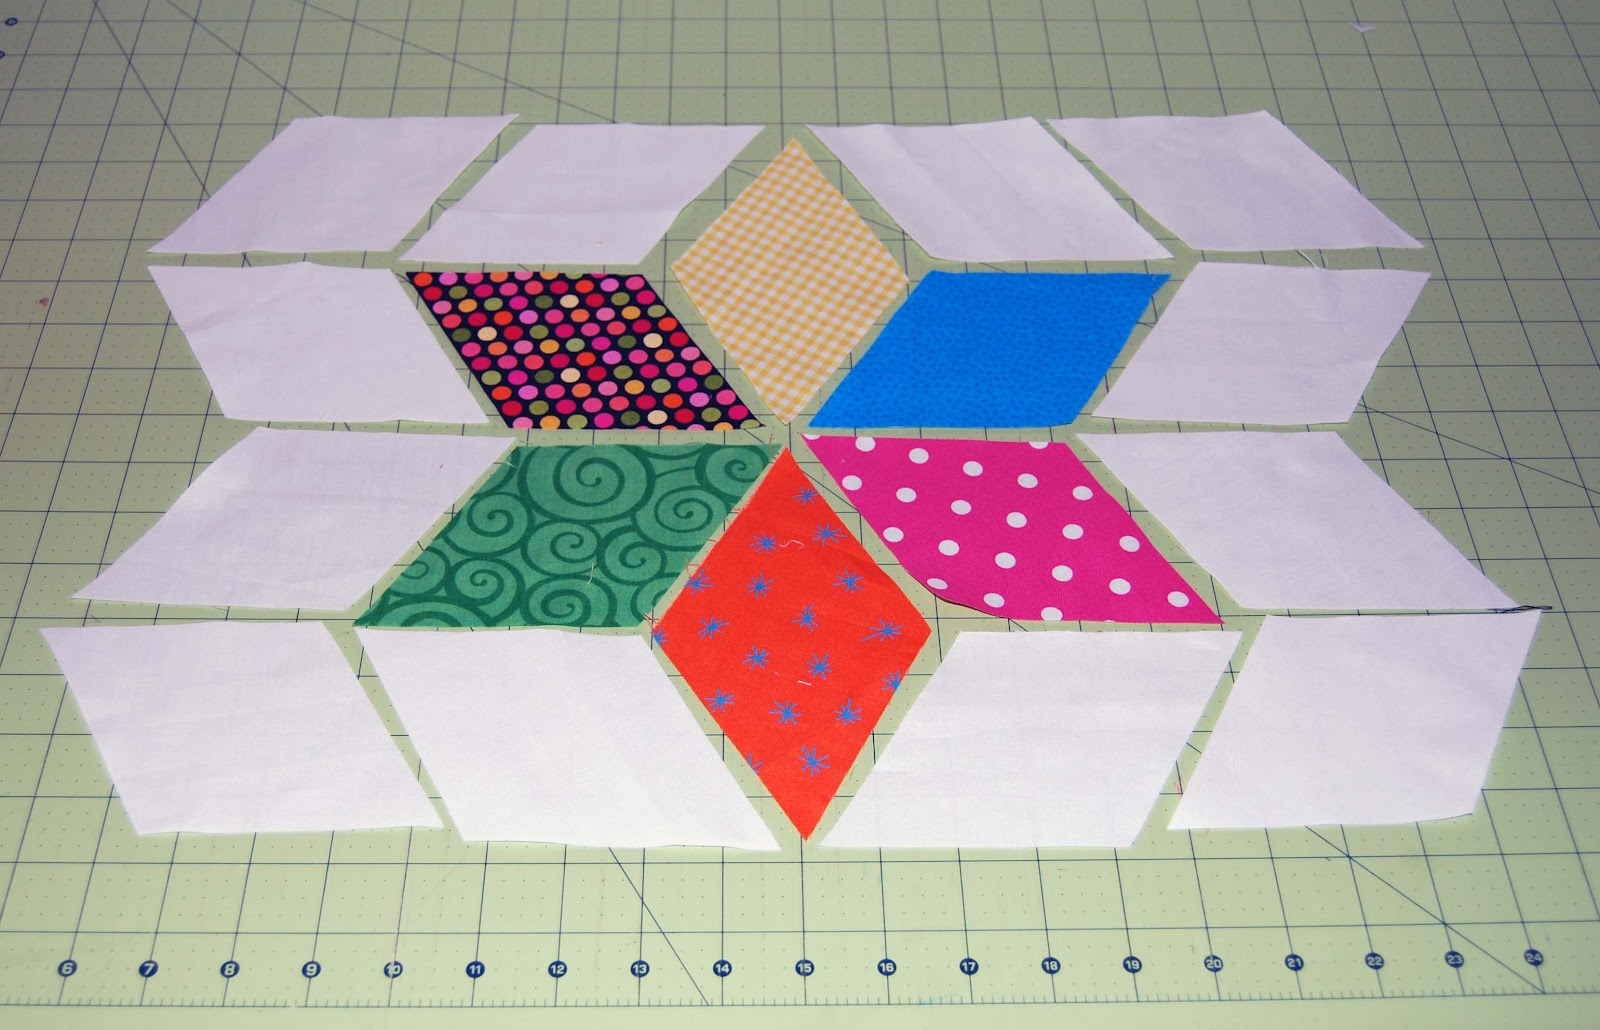 Linz Sews: Six Point Diamond Star Tutorial : diamond star quilt block pattern - Adamdwight.com